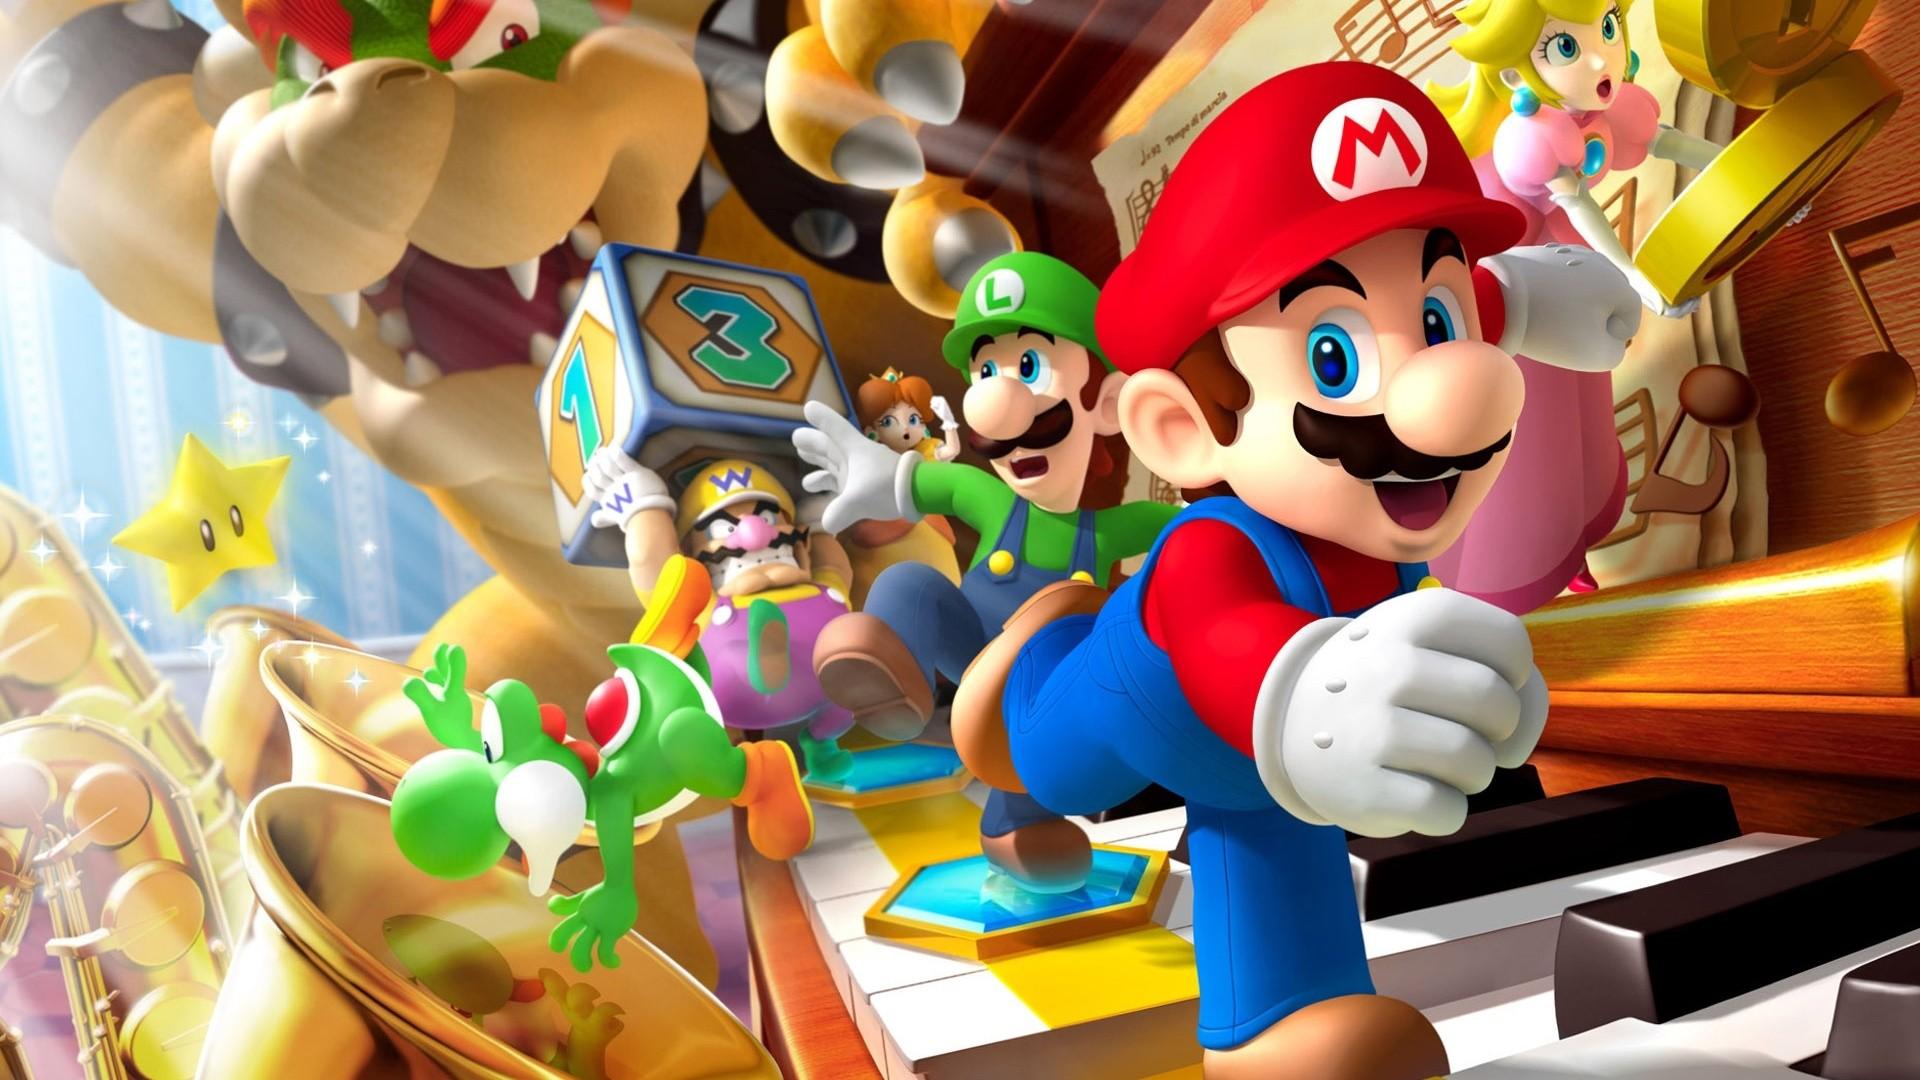 Nintendo hd desktop wallpaper